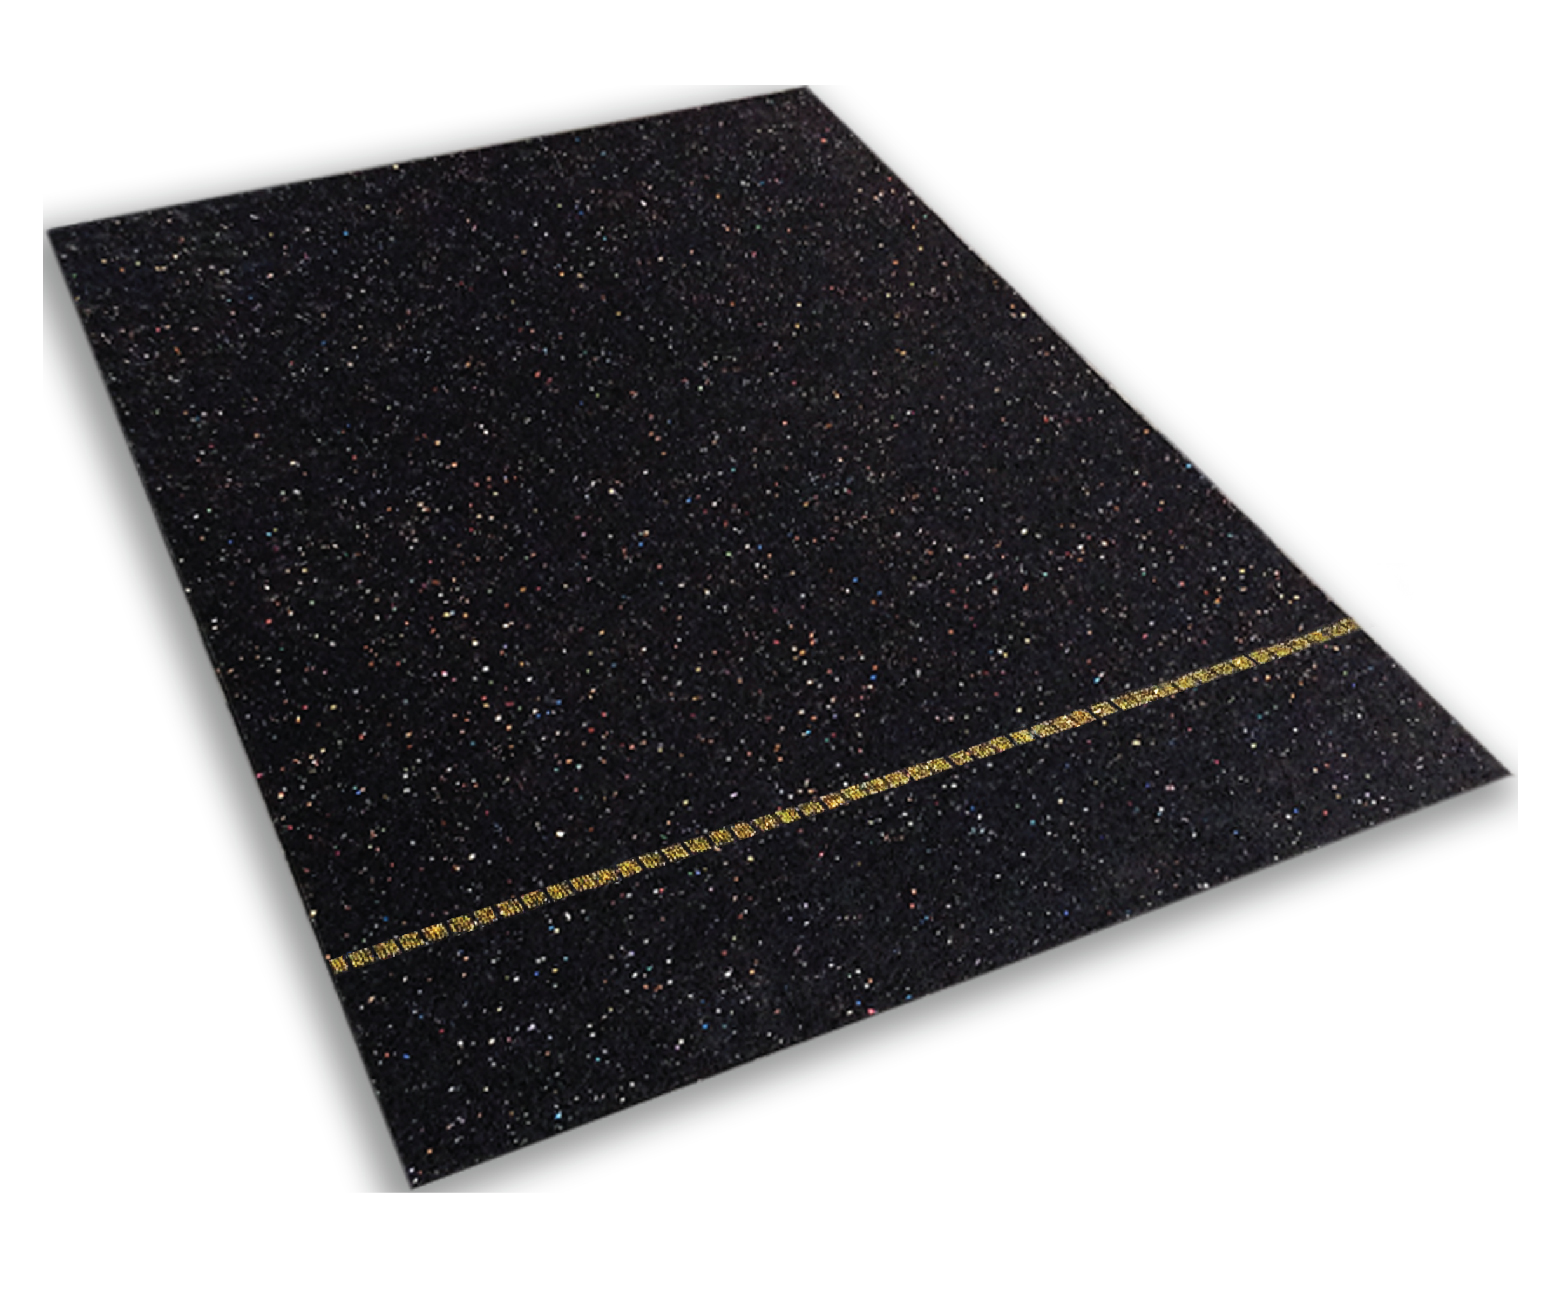 Paper Bag Floors On Concrete: Load Securement Systems